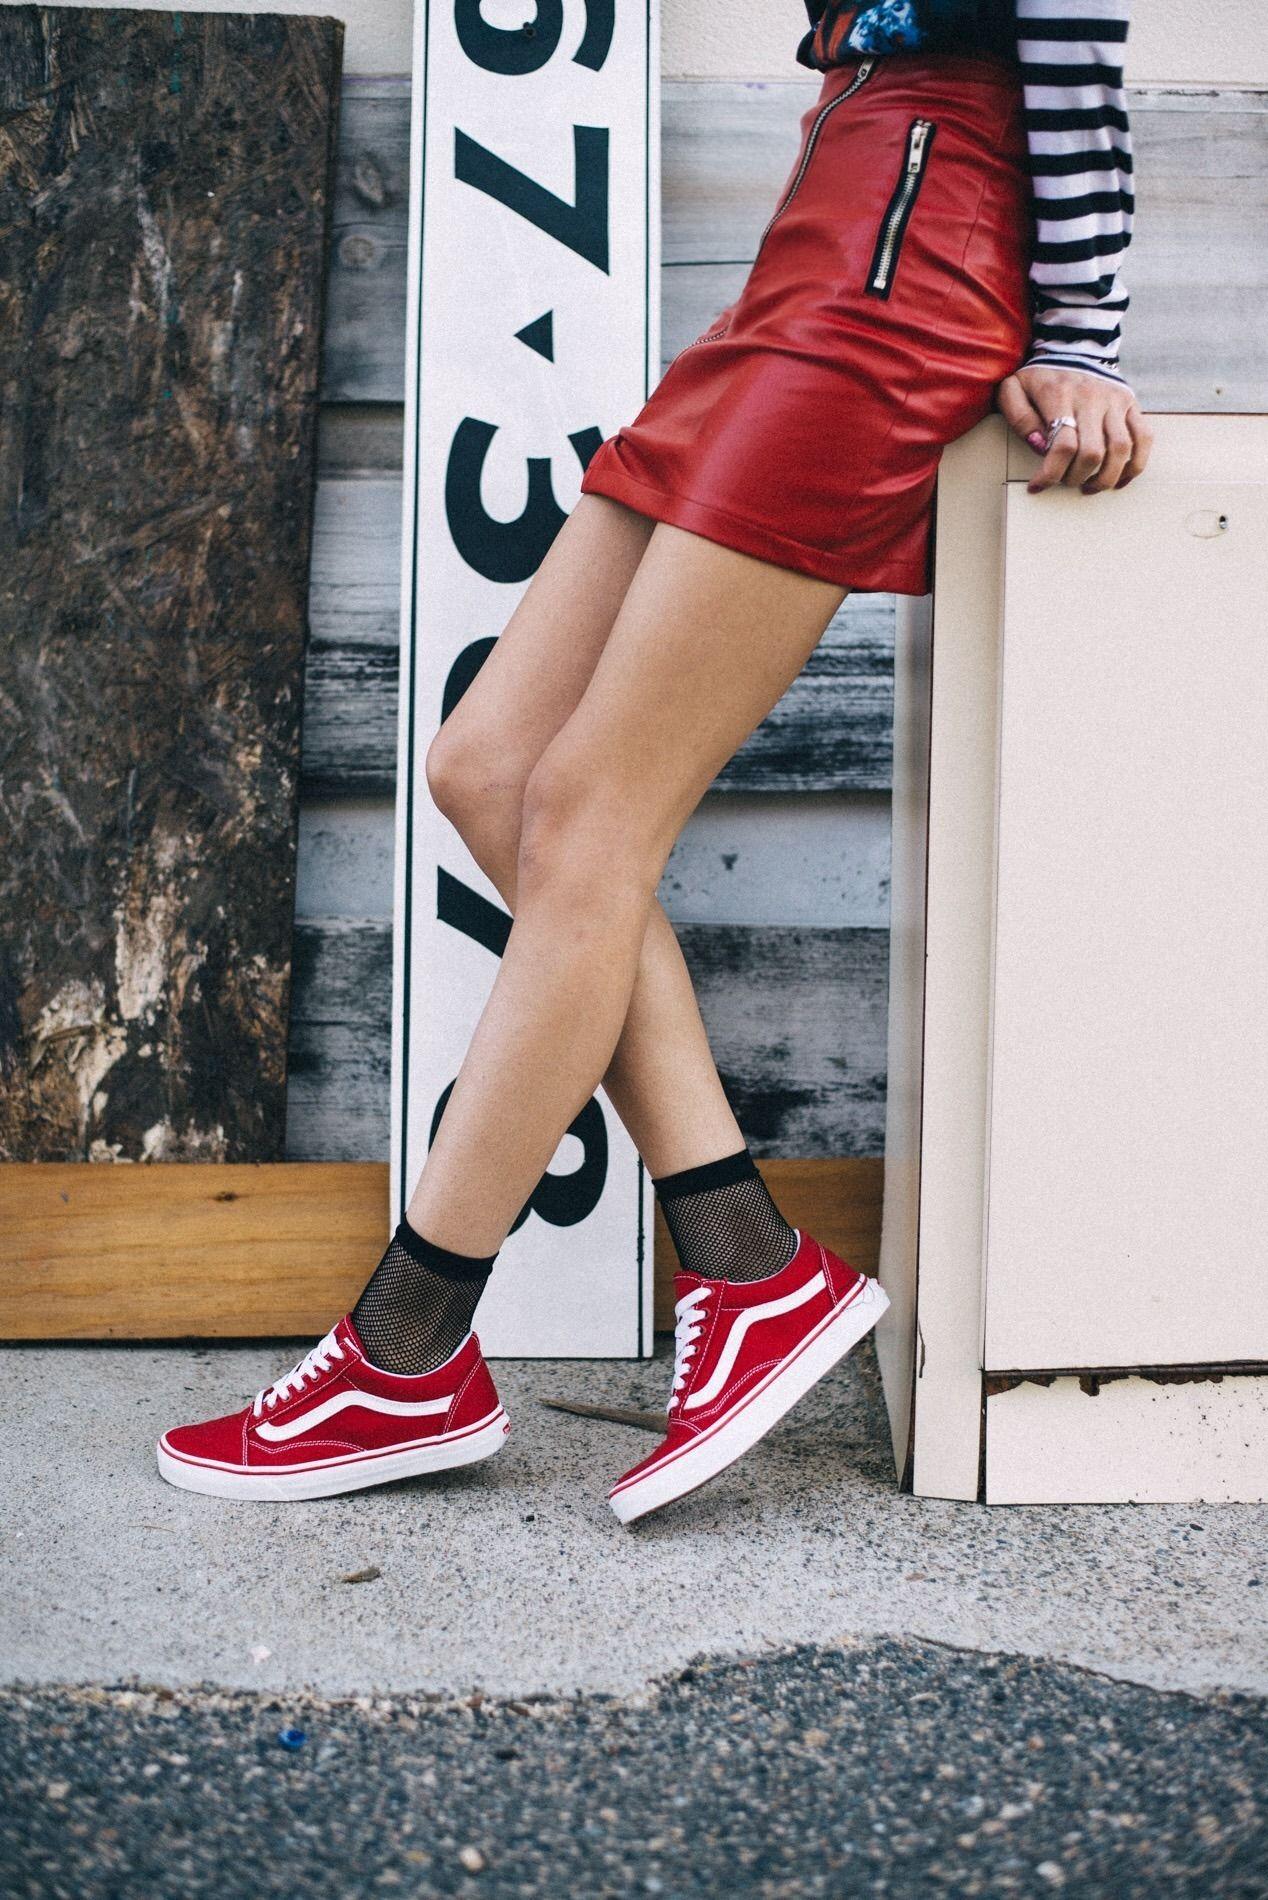 scarpe vans rosse e bianche